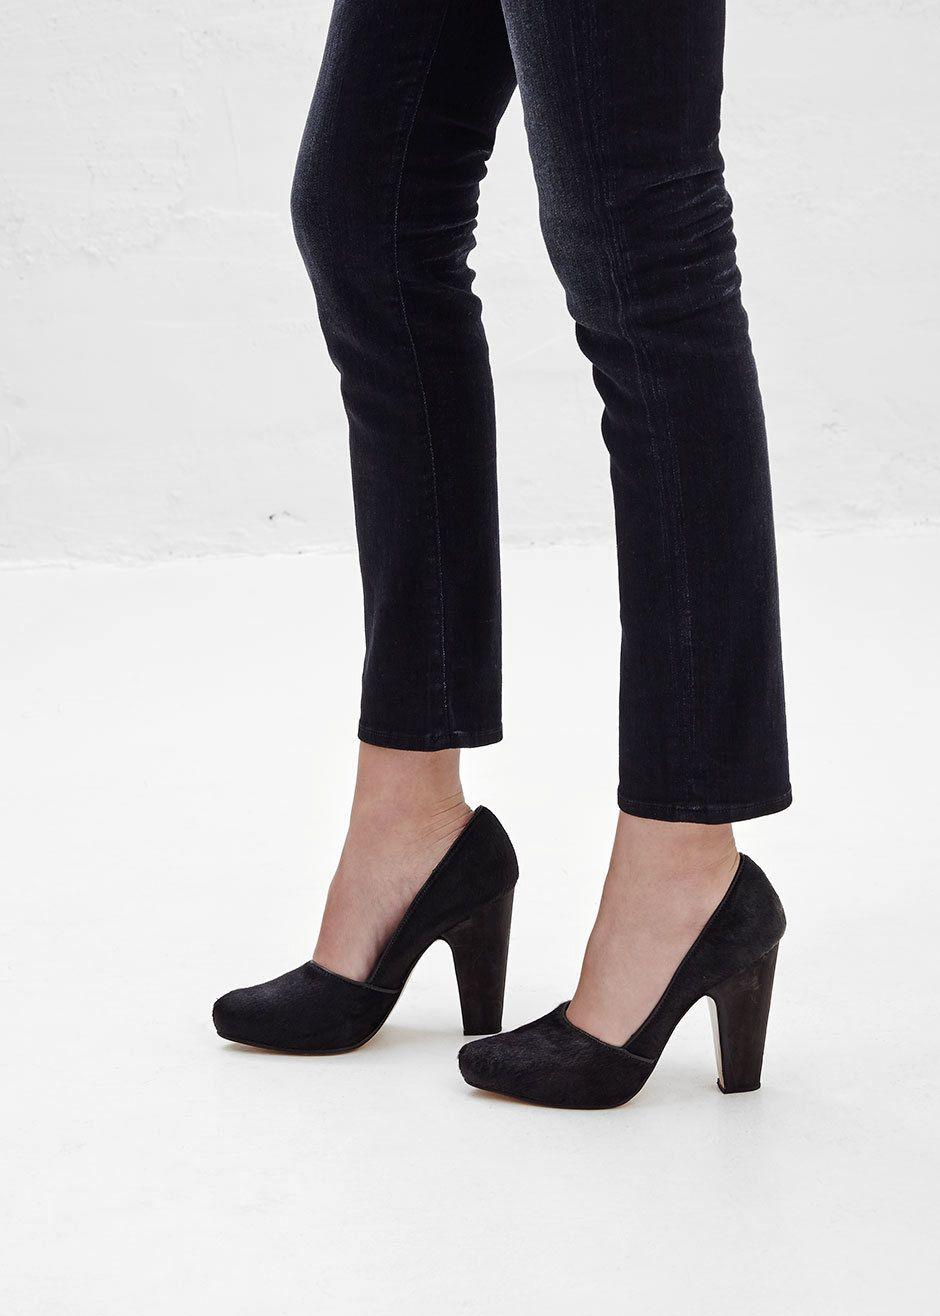 Rachel Comey Exclusive Solitaire Heel (Solid Black Haircalf)